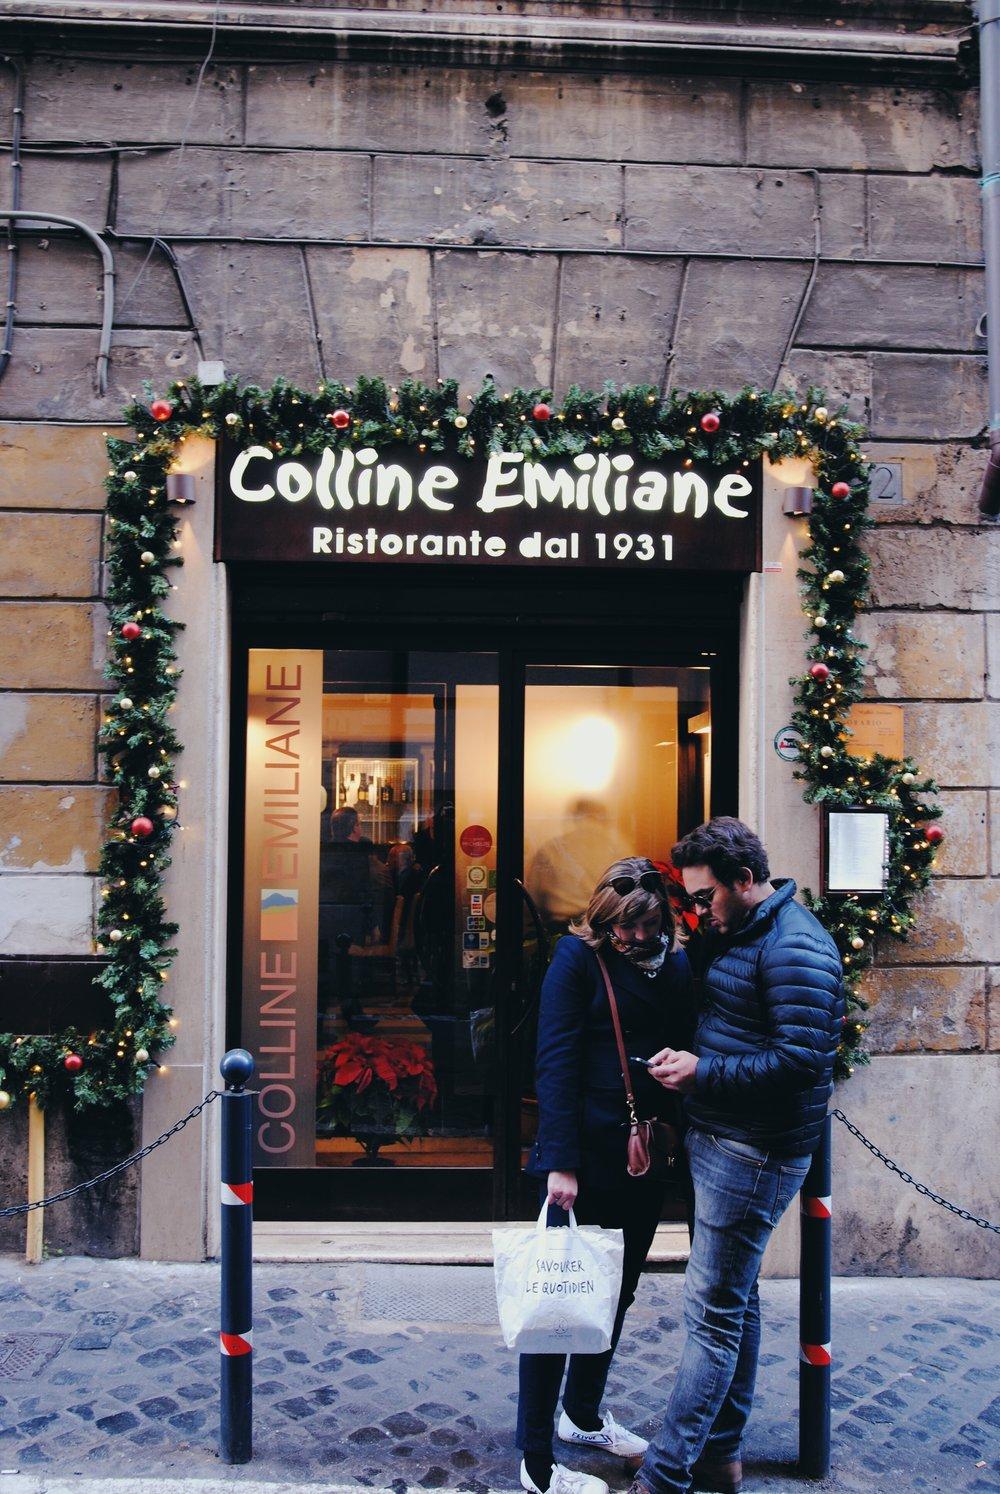 Colline Emiliane: Entrance to the Restaurant